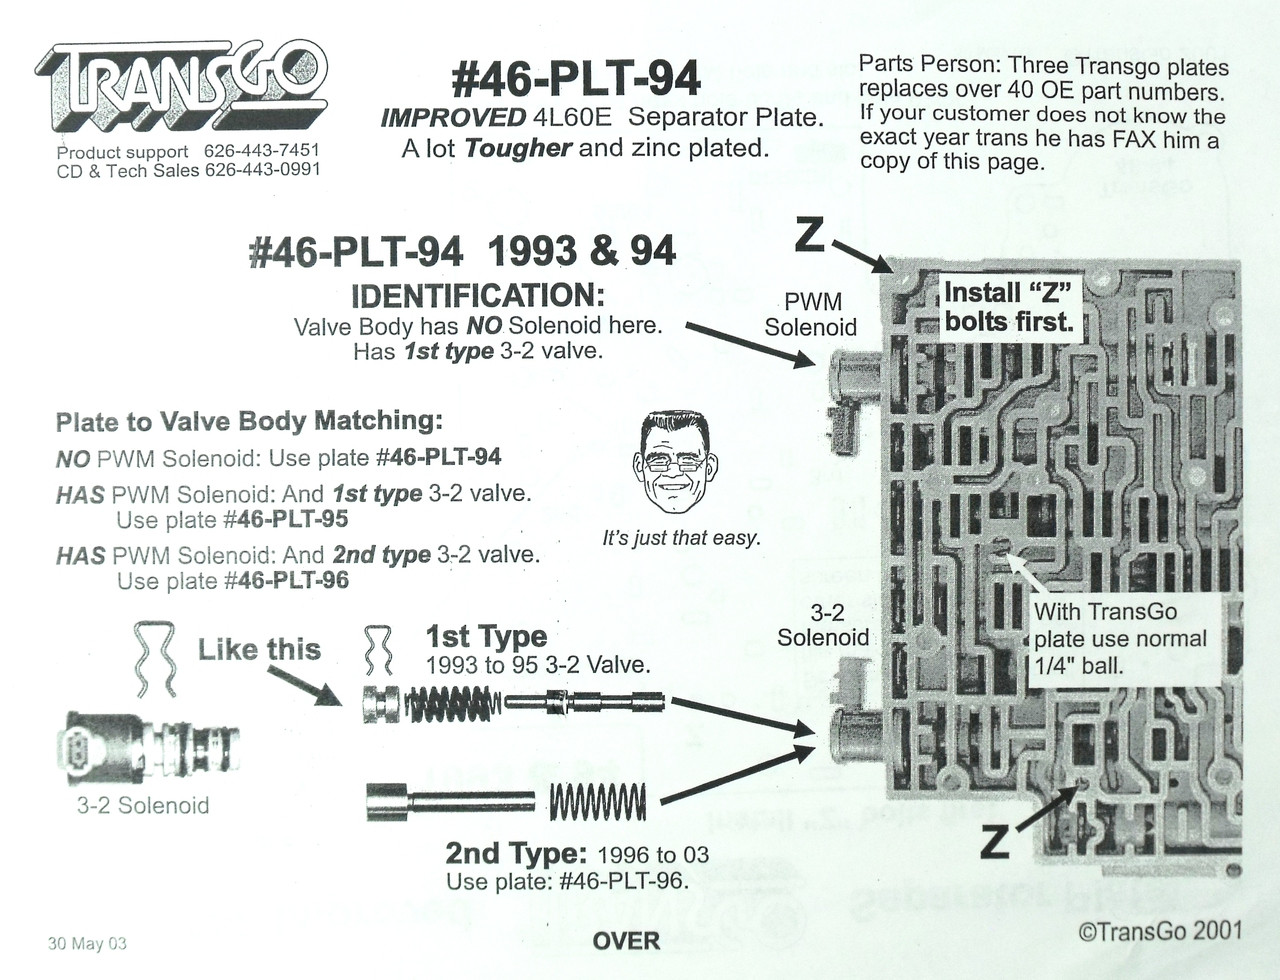 4L60E New Heavy Duty Zinc Plated Valve Body Plate 1996-2006 Transgo # 46-PLT-96